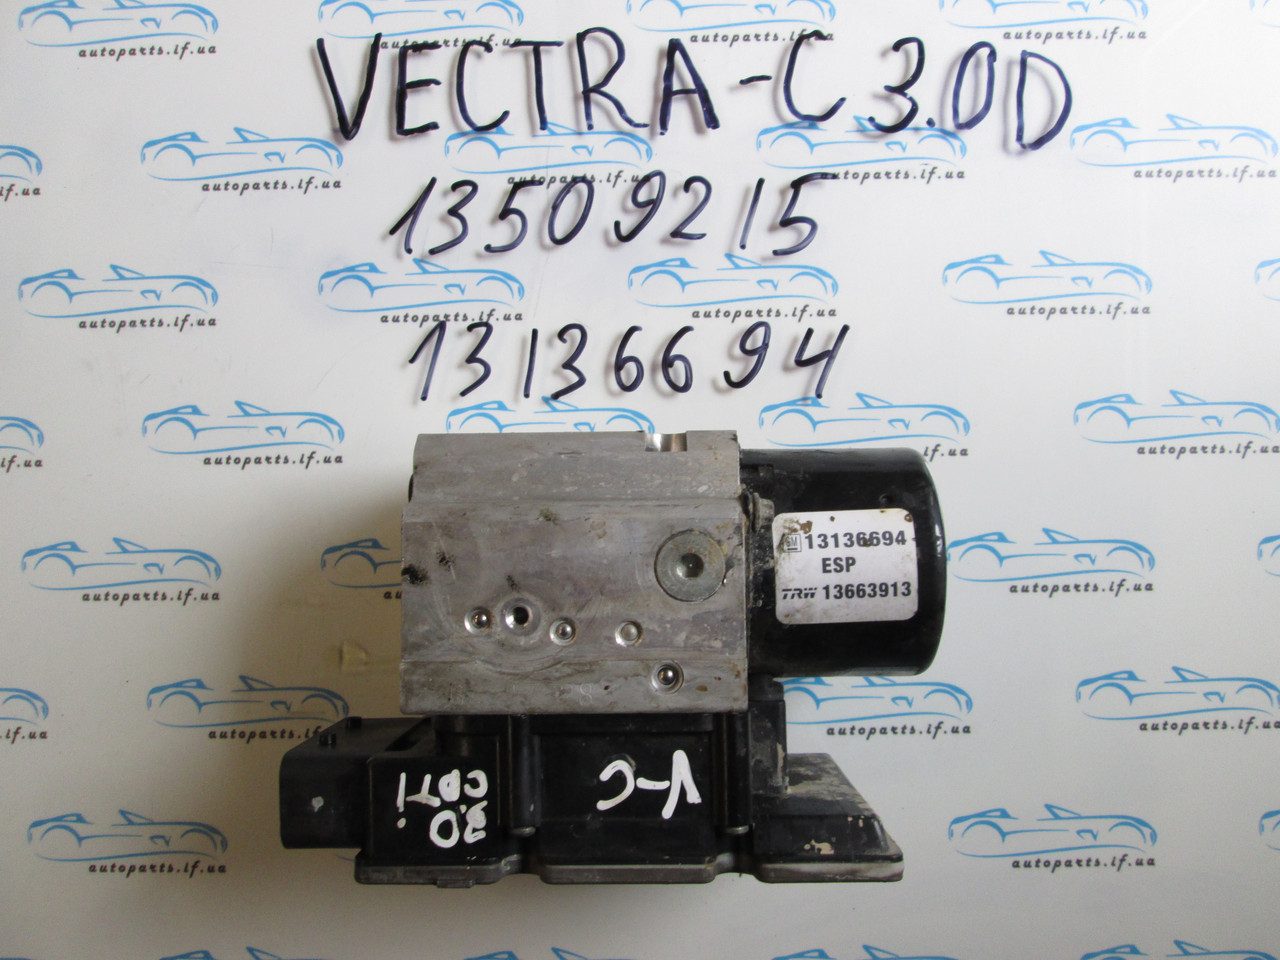 Блок АБС Опель Вектра С, Vectra C 13509215,13136694